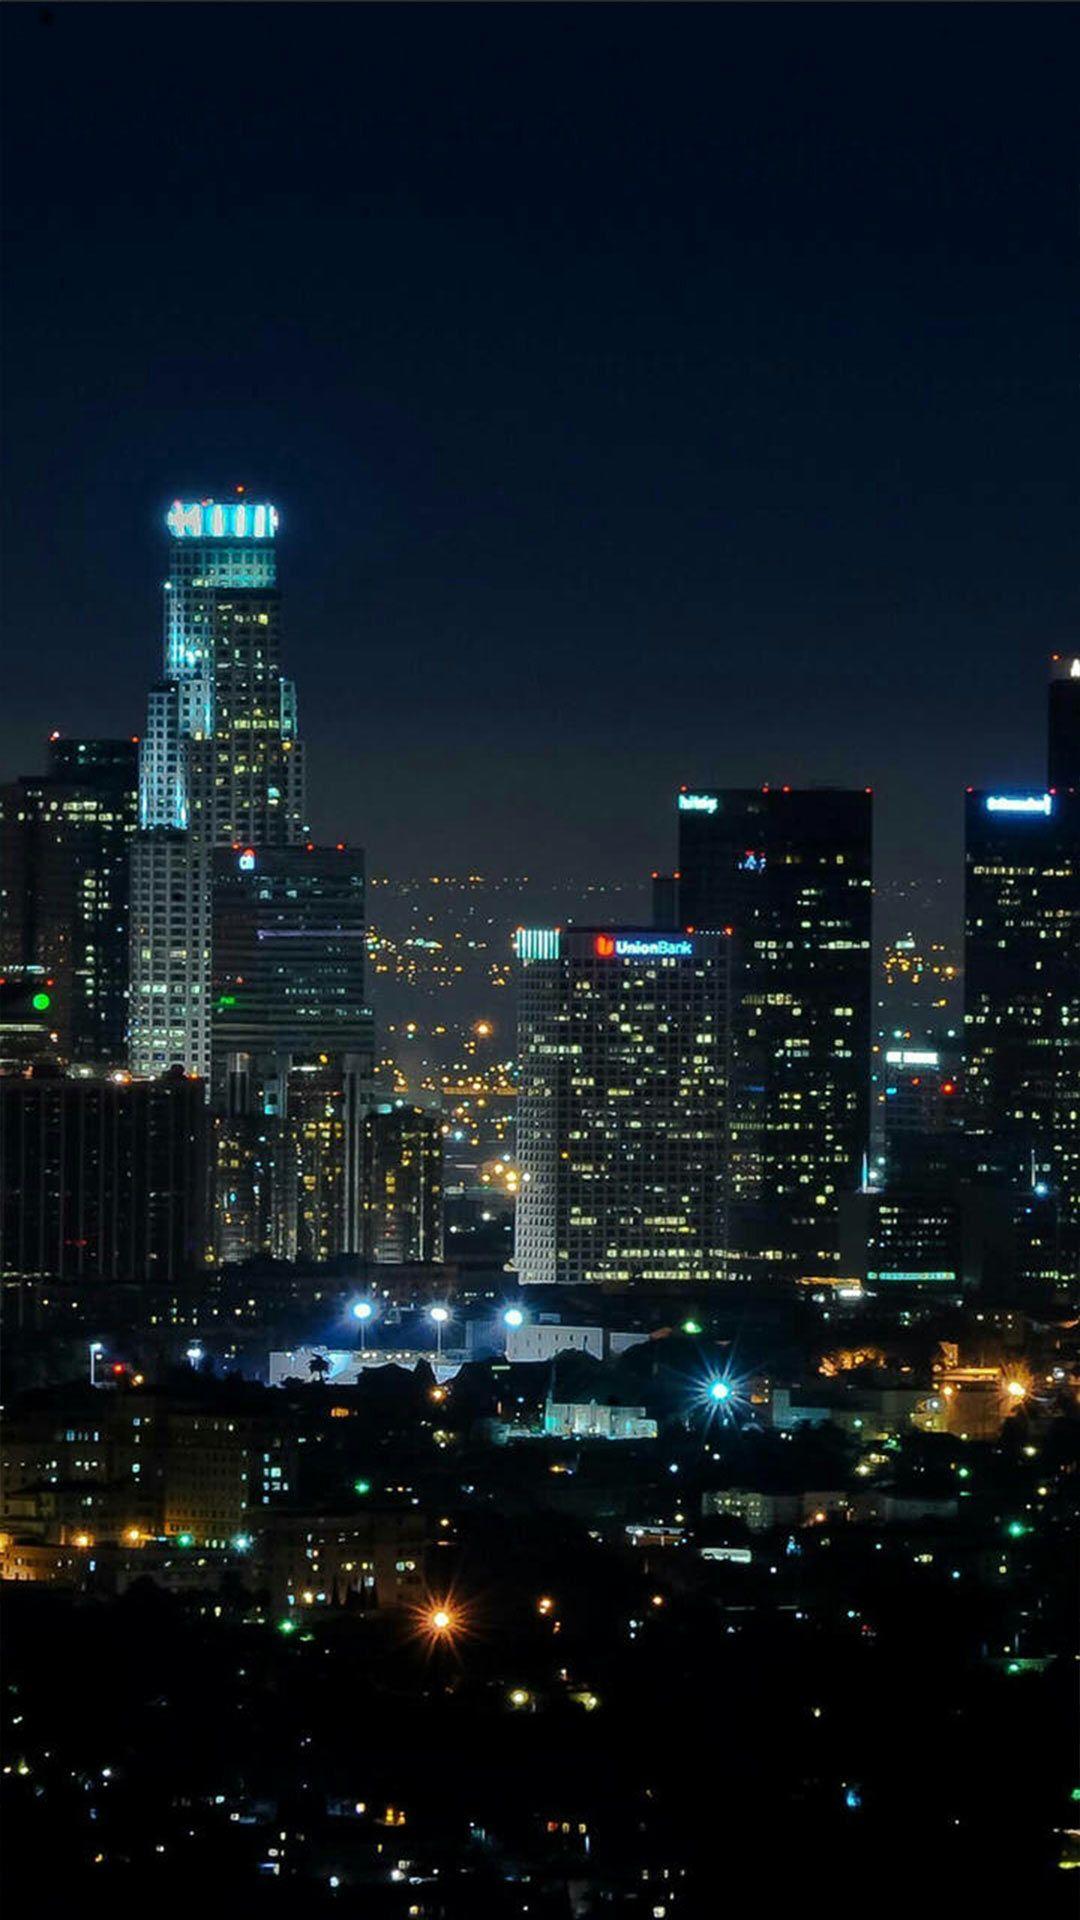 iPhone 11 Wallpaper Landscape Night City Night in 2020